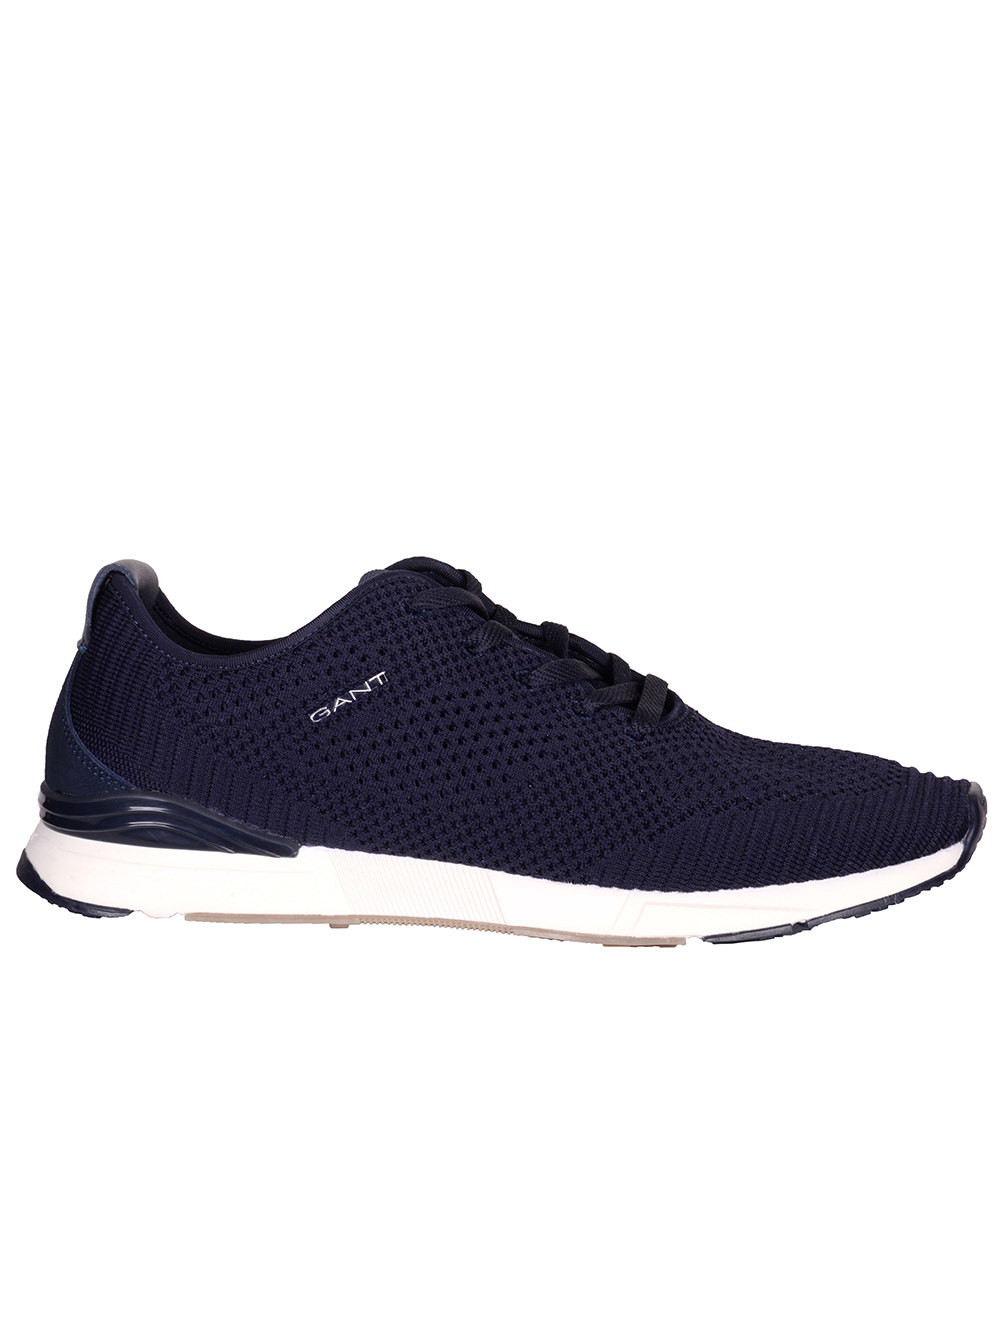 GANT Παπούτσια sneakers 3GS22637624-9 ΜΠΛΕ